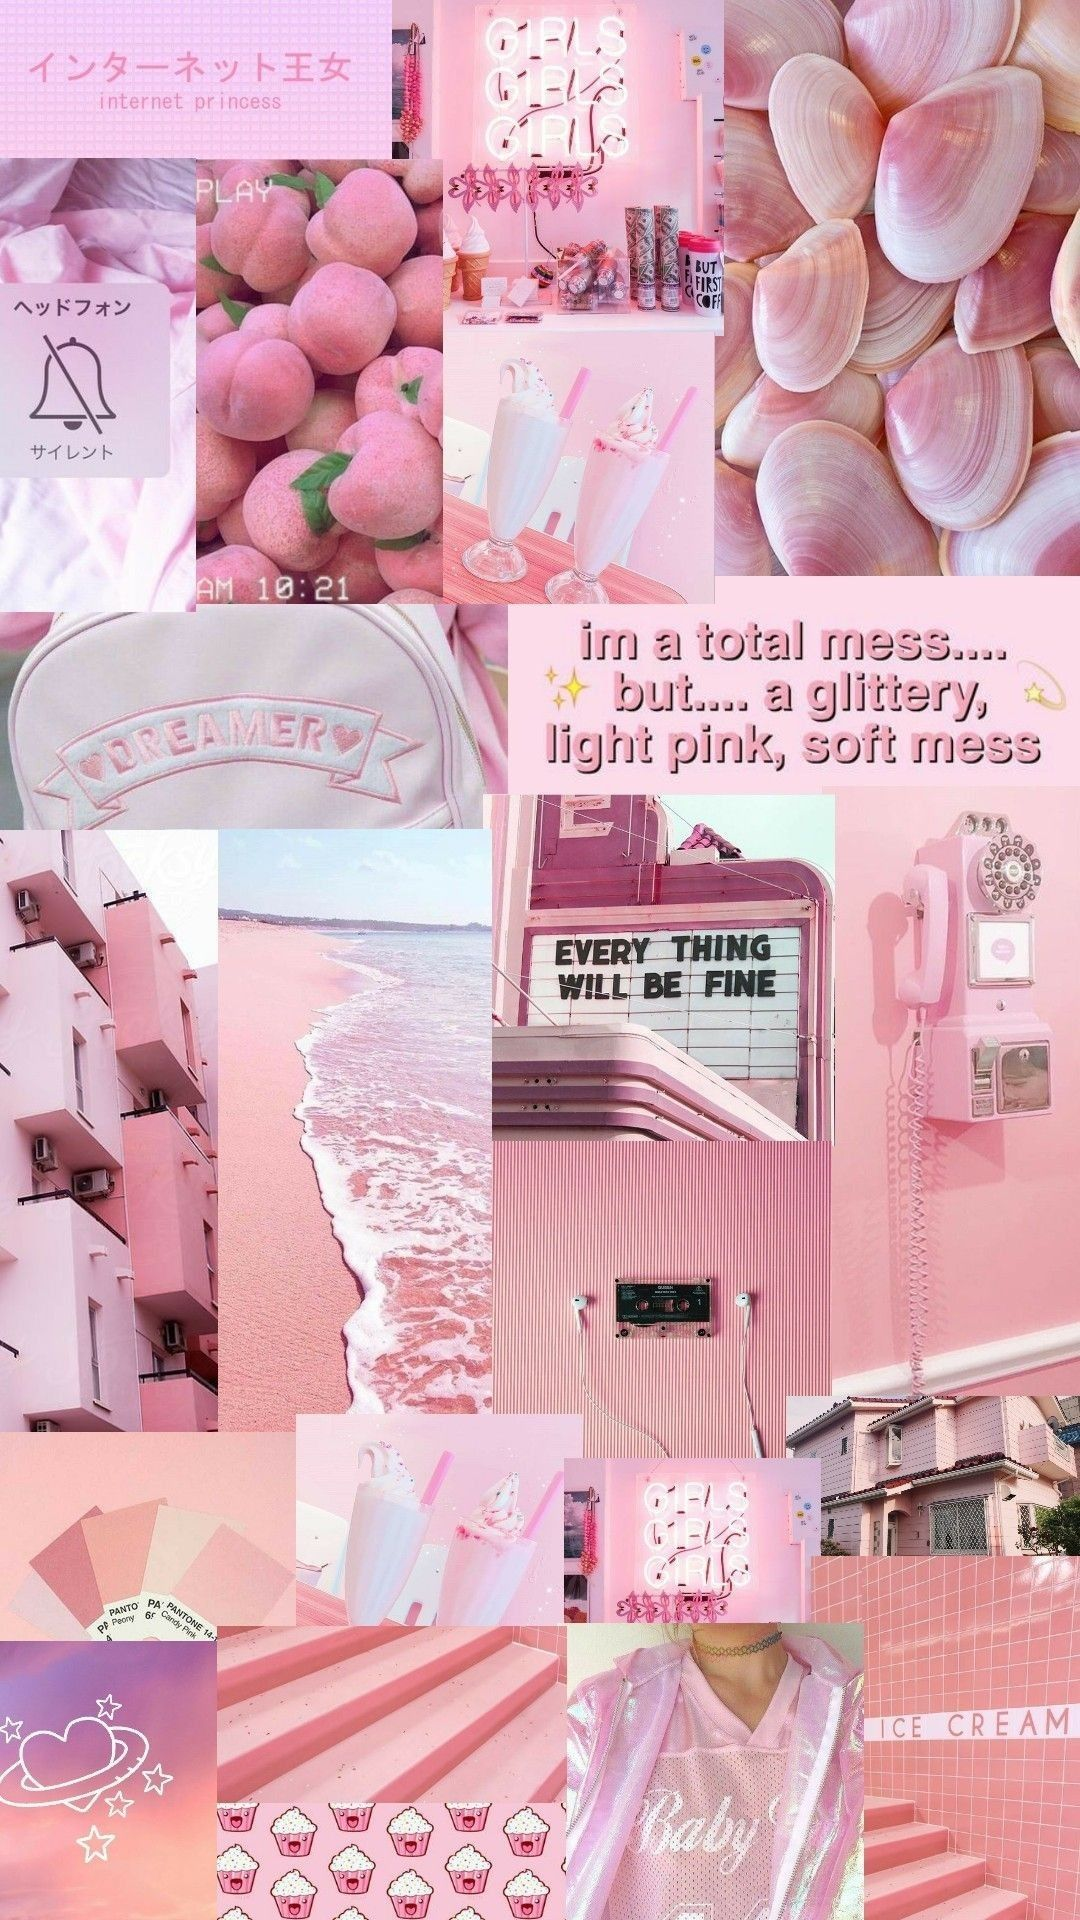 Pin by Fatihah Samsudin on Pinky Iphone wallpaper